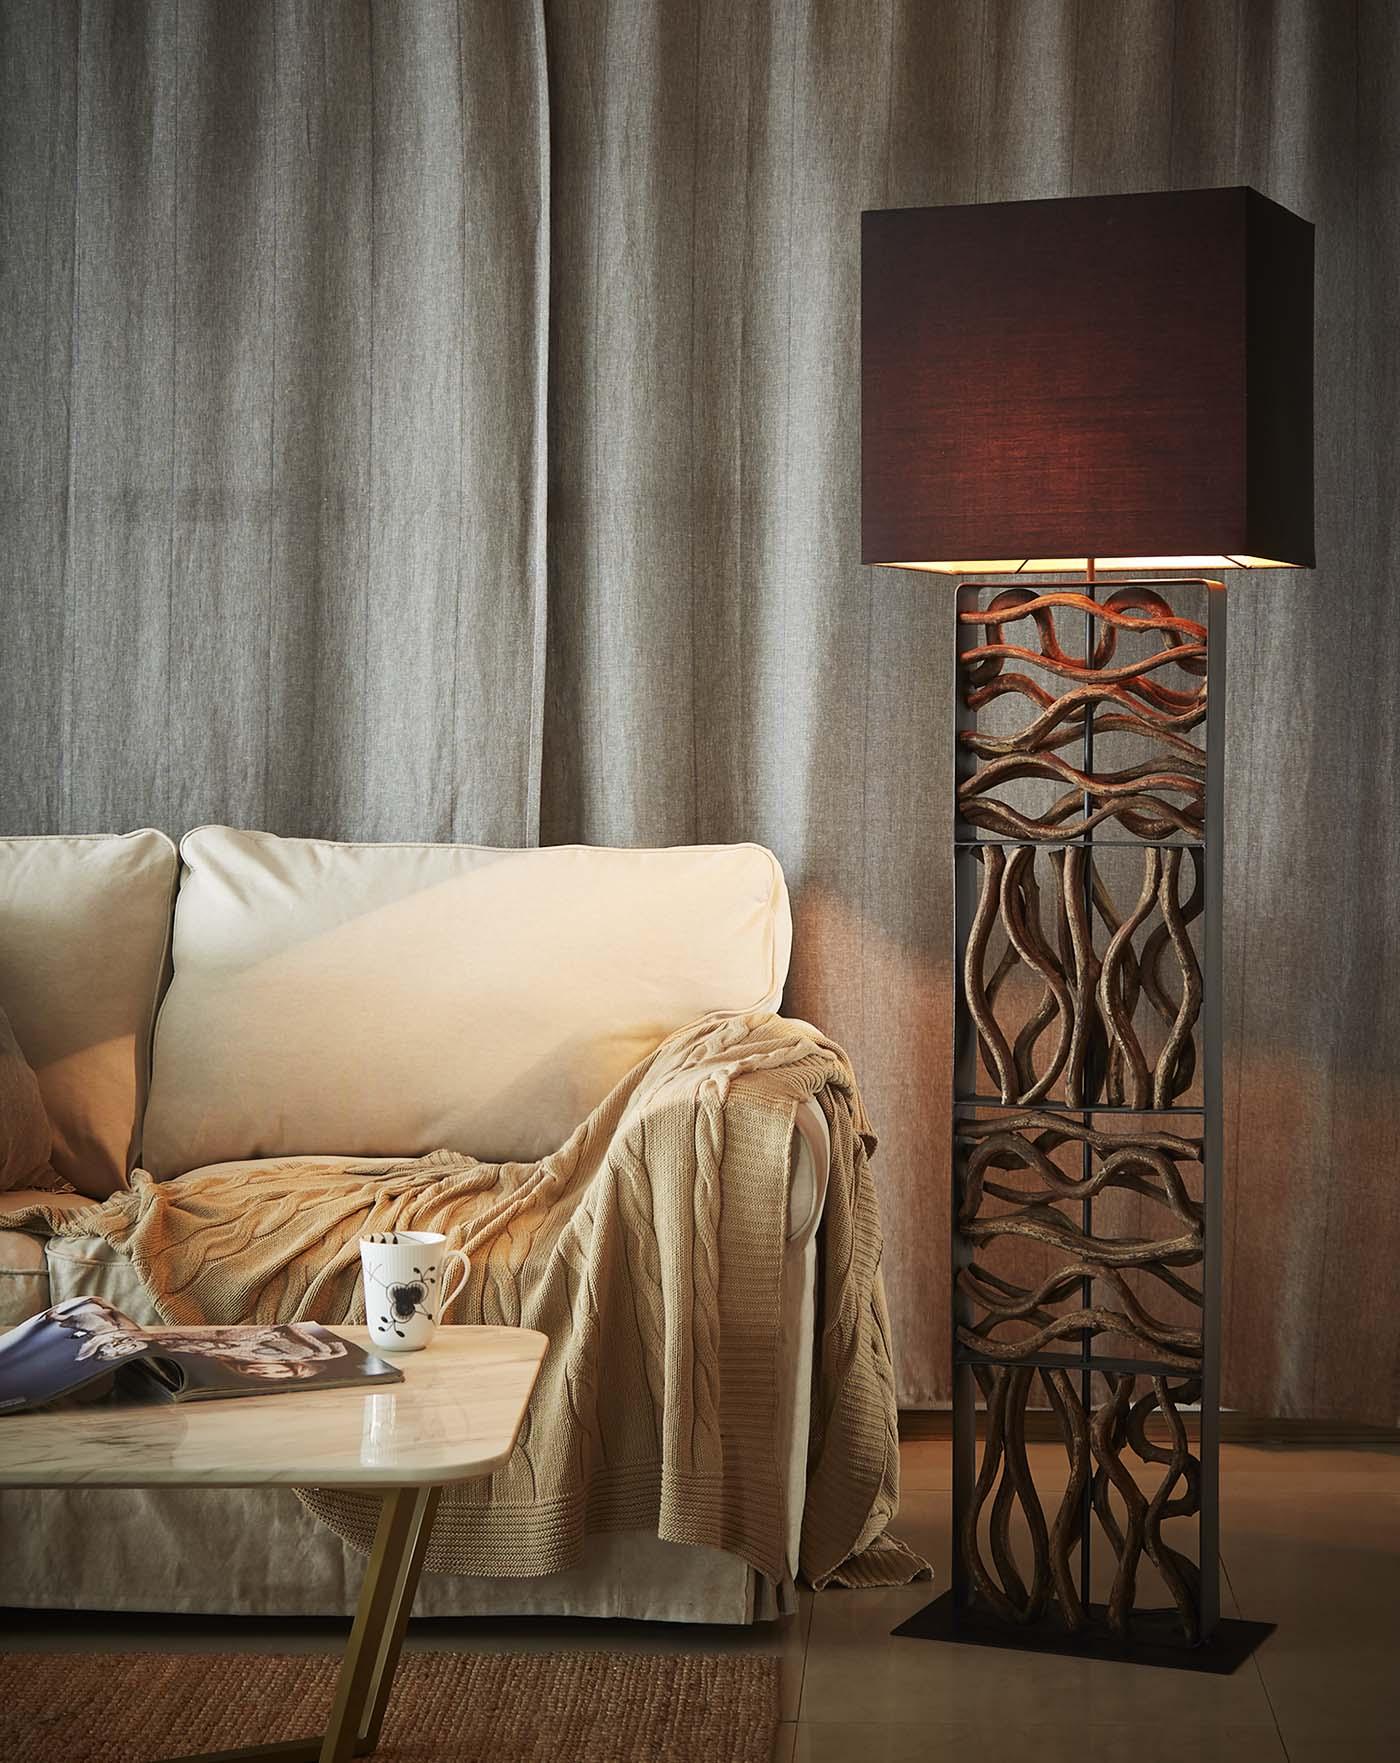 Movement Floor lamp product photo #1